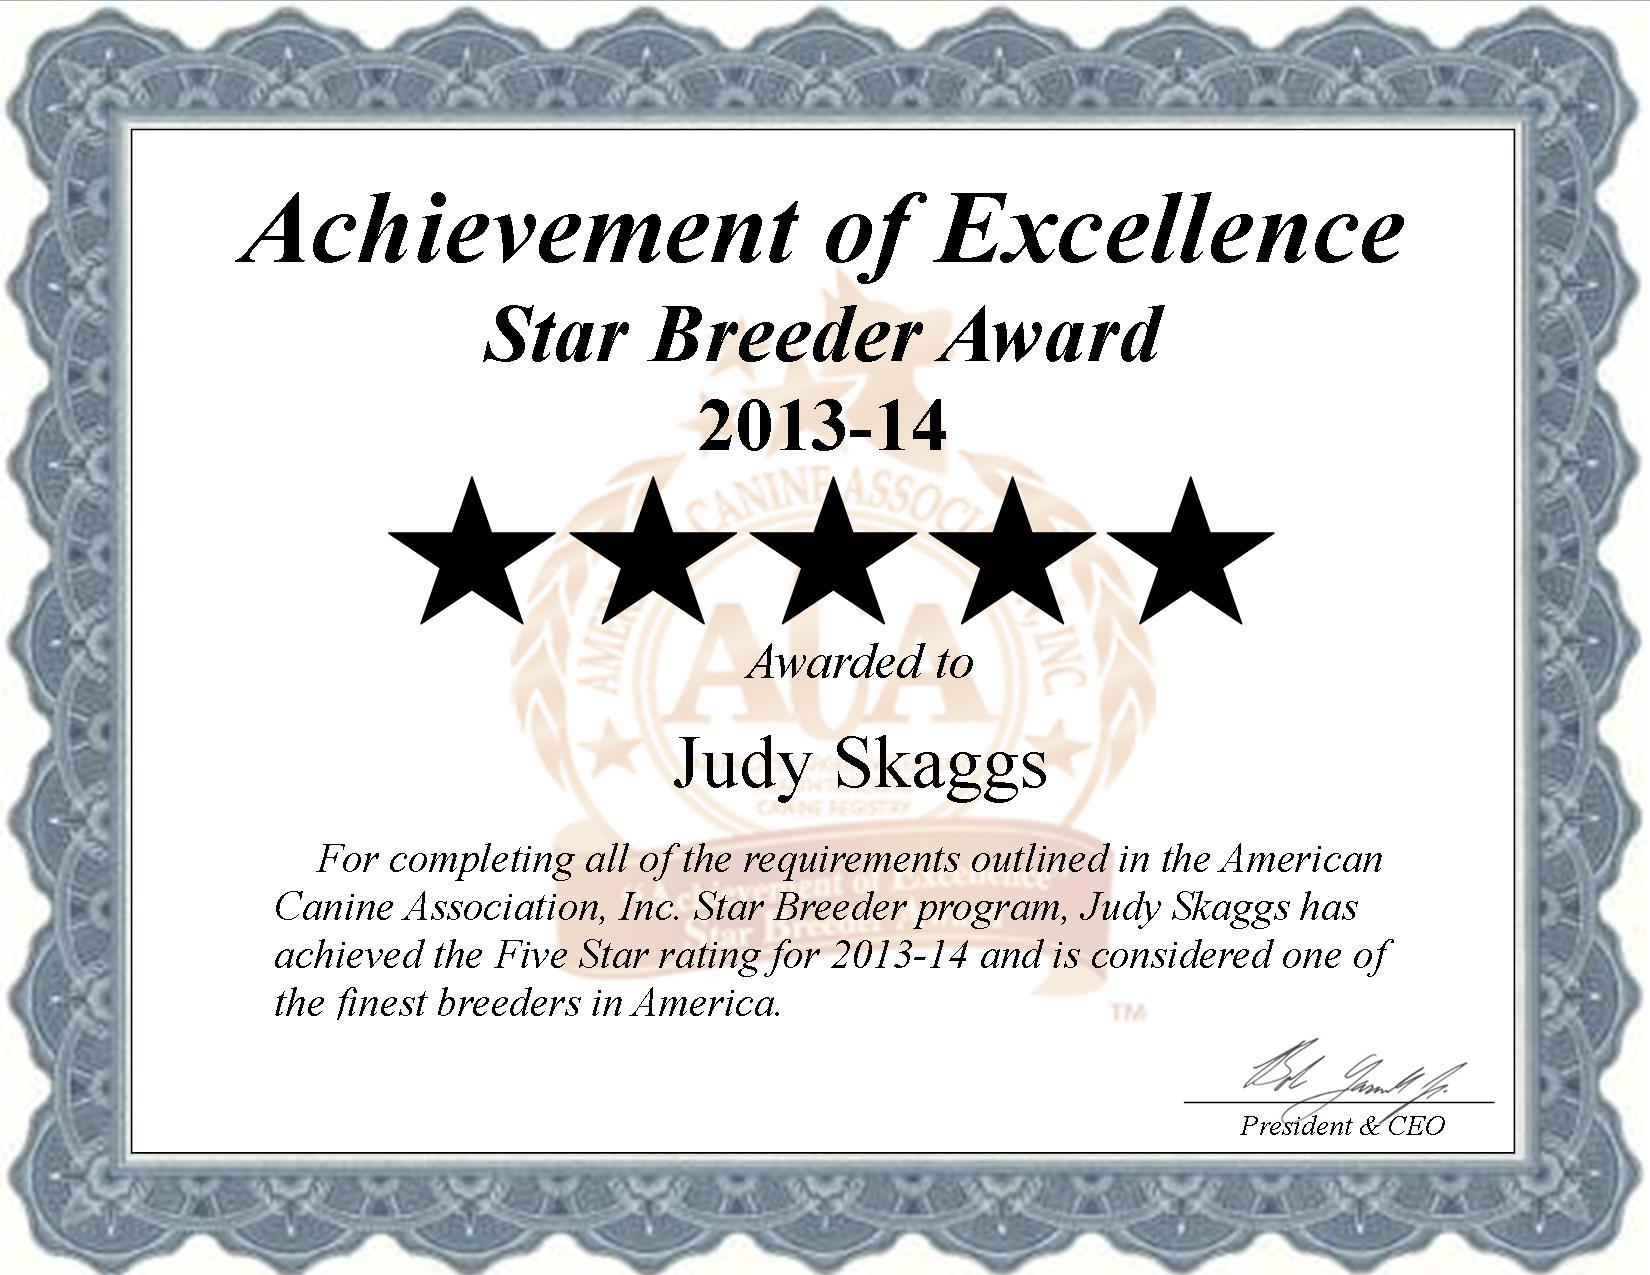 Judy, Skaggs, Judy Skaggs, Judy s. Skaggs, Skaggs Kennel, breeder, star breeder, aca, star breeder, 5 star, Langley, Oklahoma, OK, dog, puppy, puppies, dog breeder, dog breeders, Oklahoma breeder, Judy Skaggs dog breeder